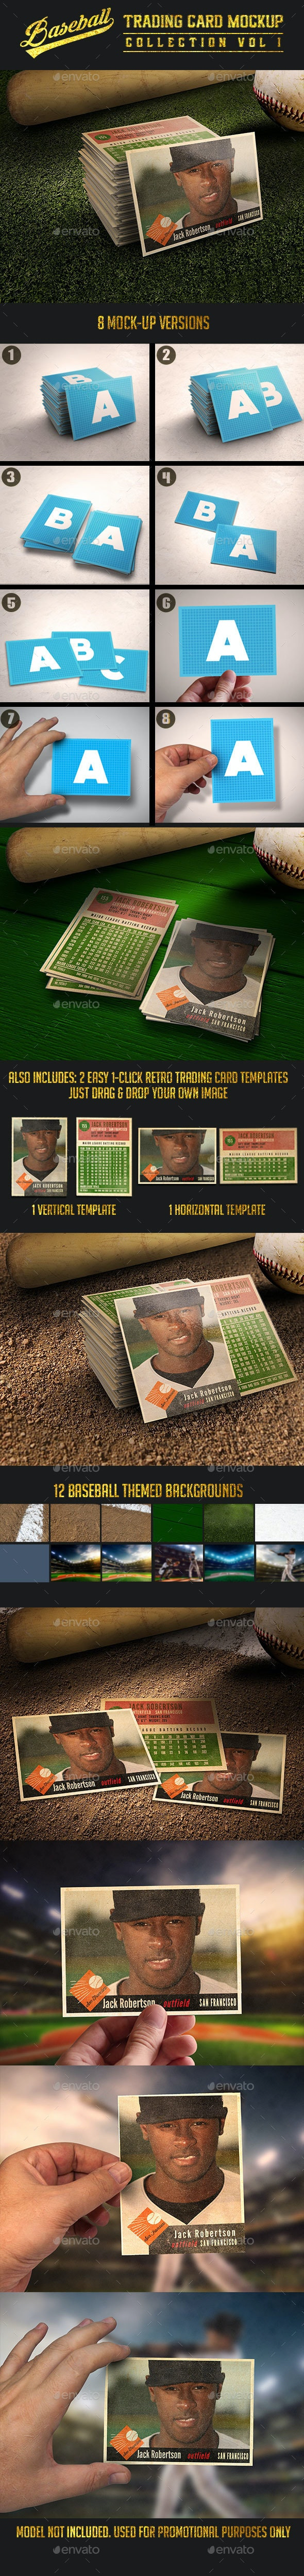 Baseball Trading Card Mock-Up Collection v1 - Miscellaneous Print